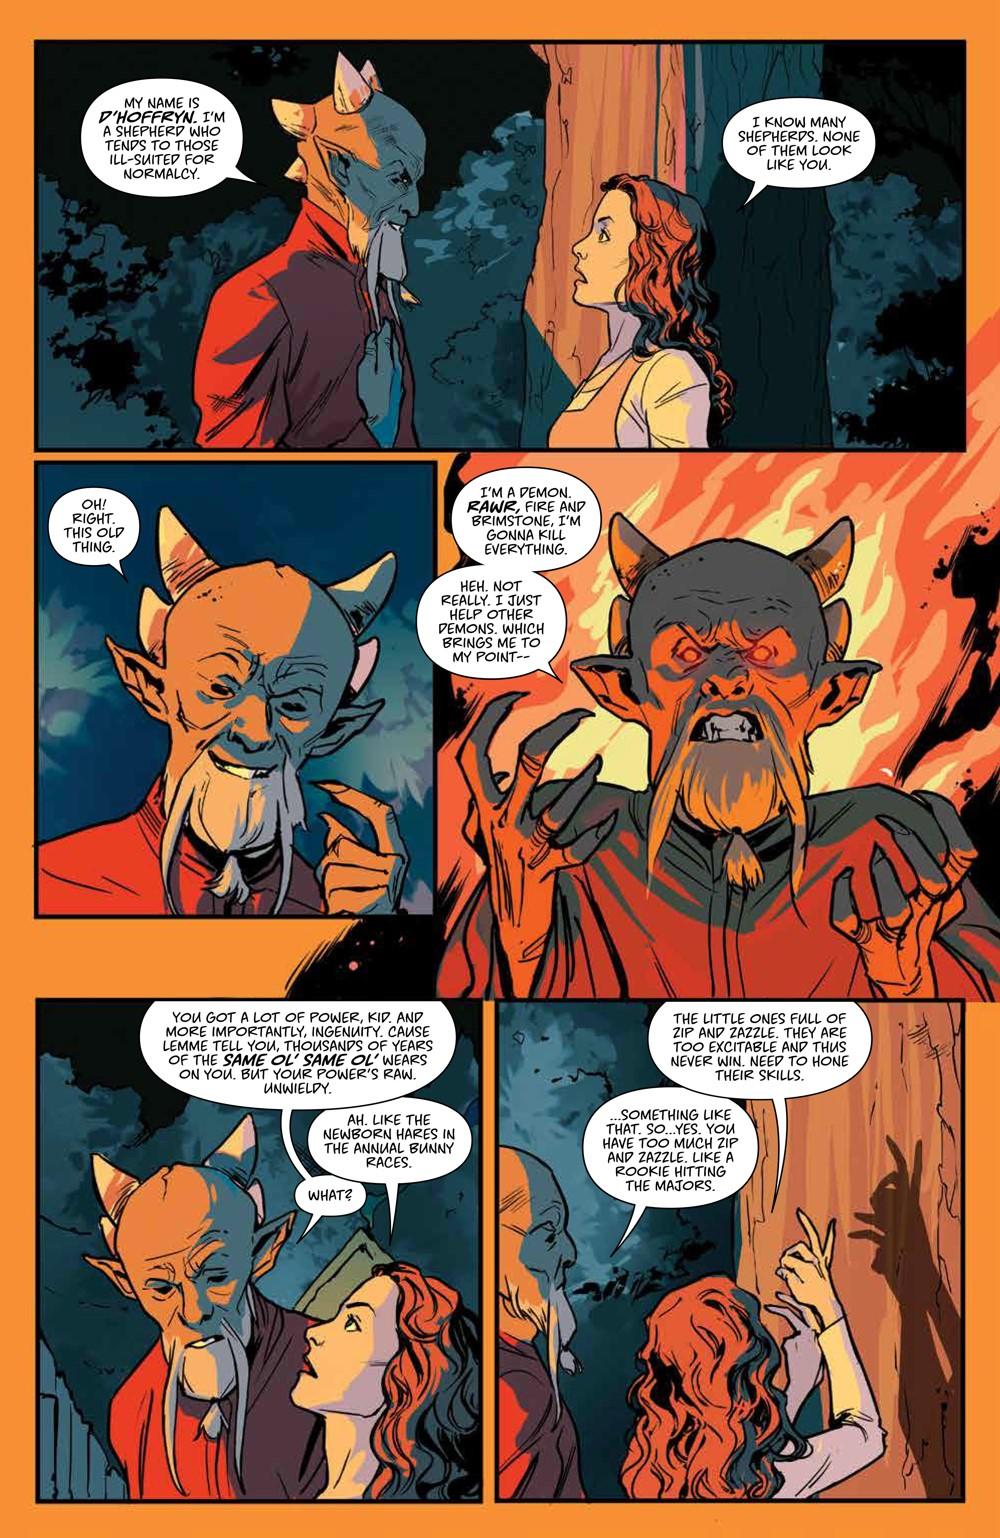 Buffy_v6_SC_PRESS_12 ComicList Previews: BUFFY THE VAMPIRE SLAYER VOLUME 6 SECRETS OF THE SLAYER TP